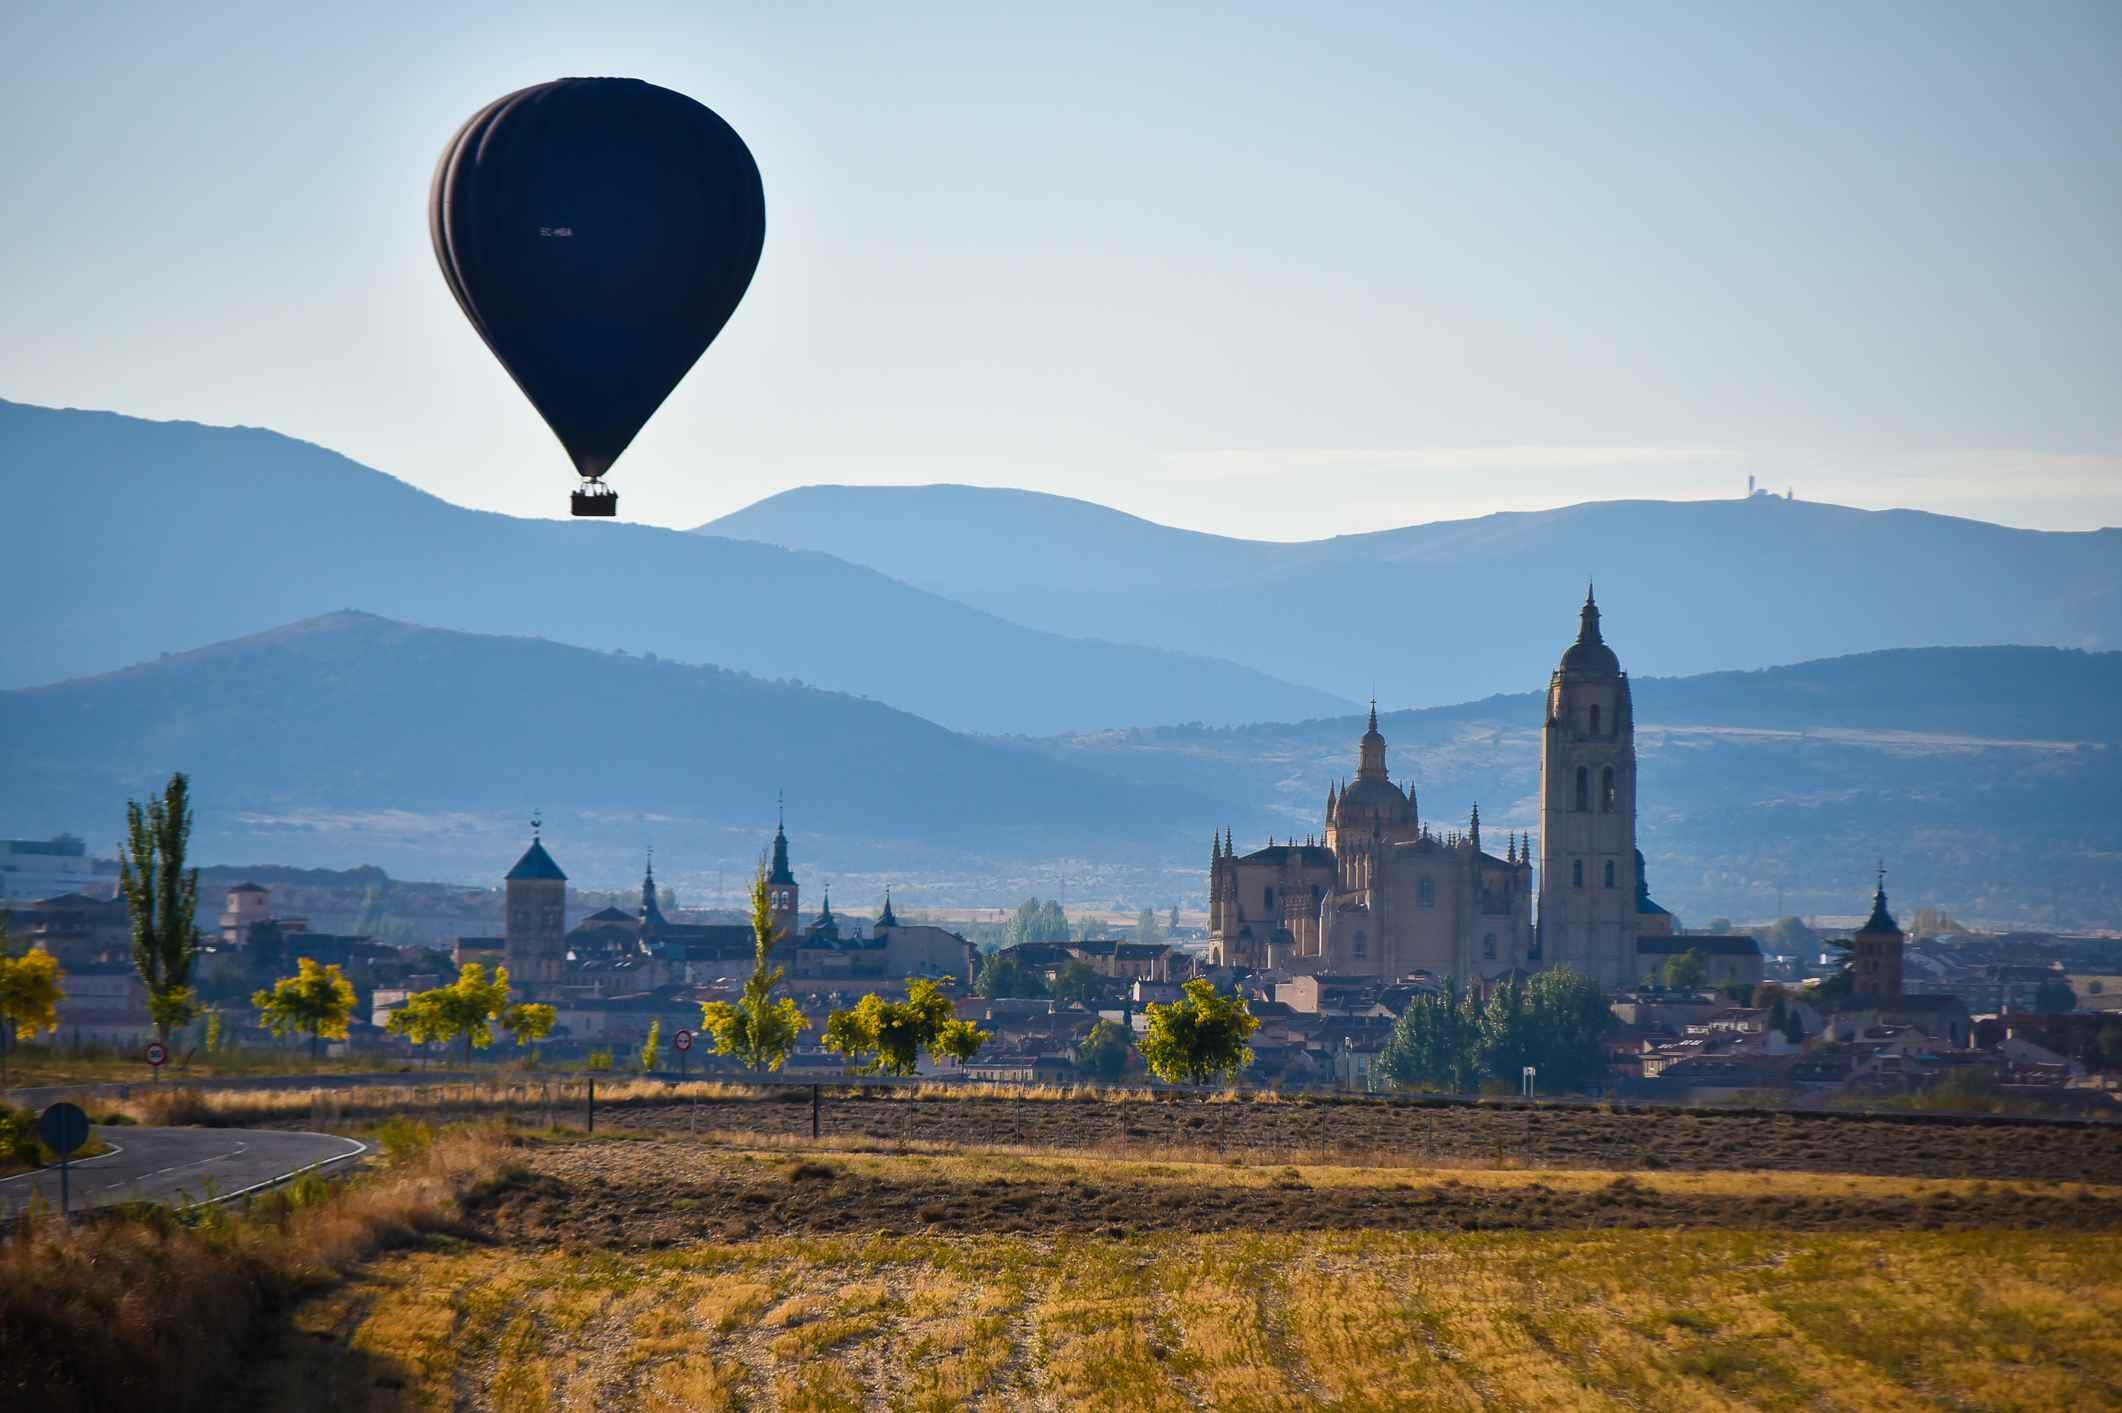 Hot air balloon flying over Segovia Spain